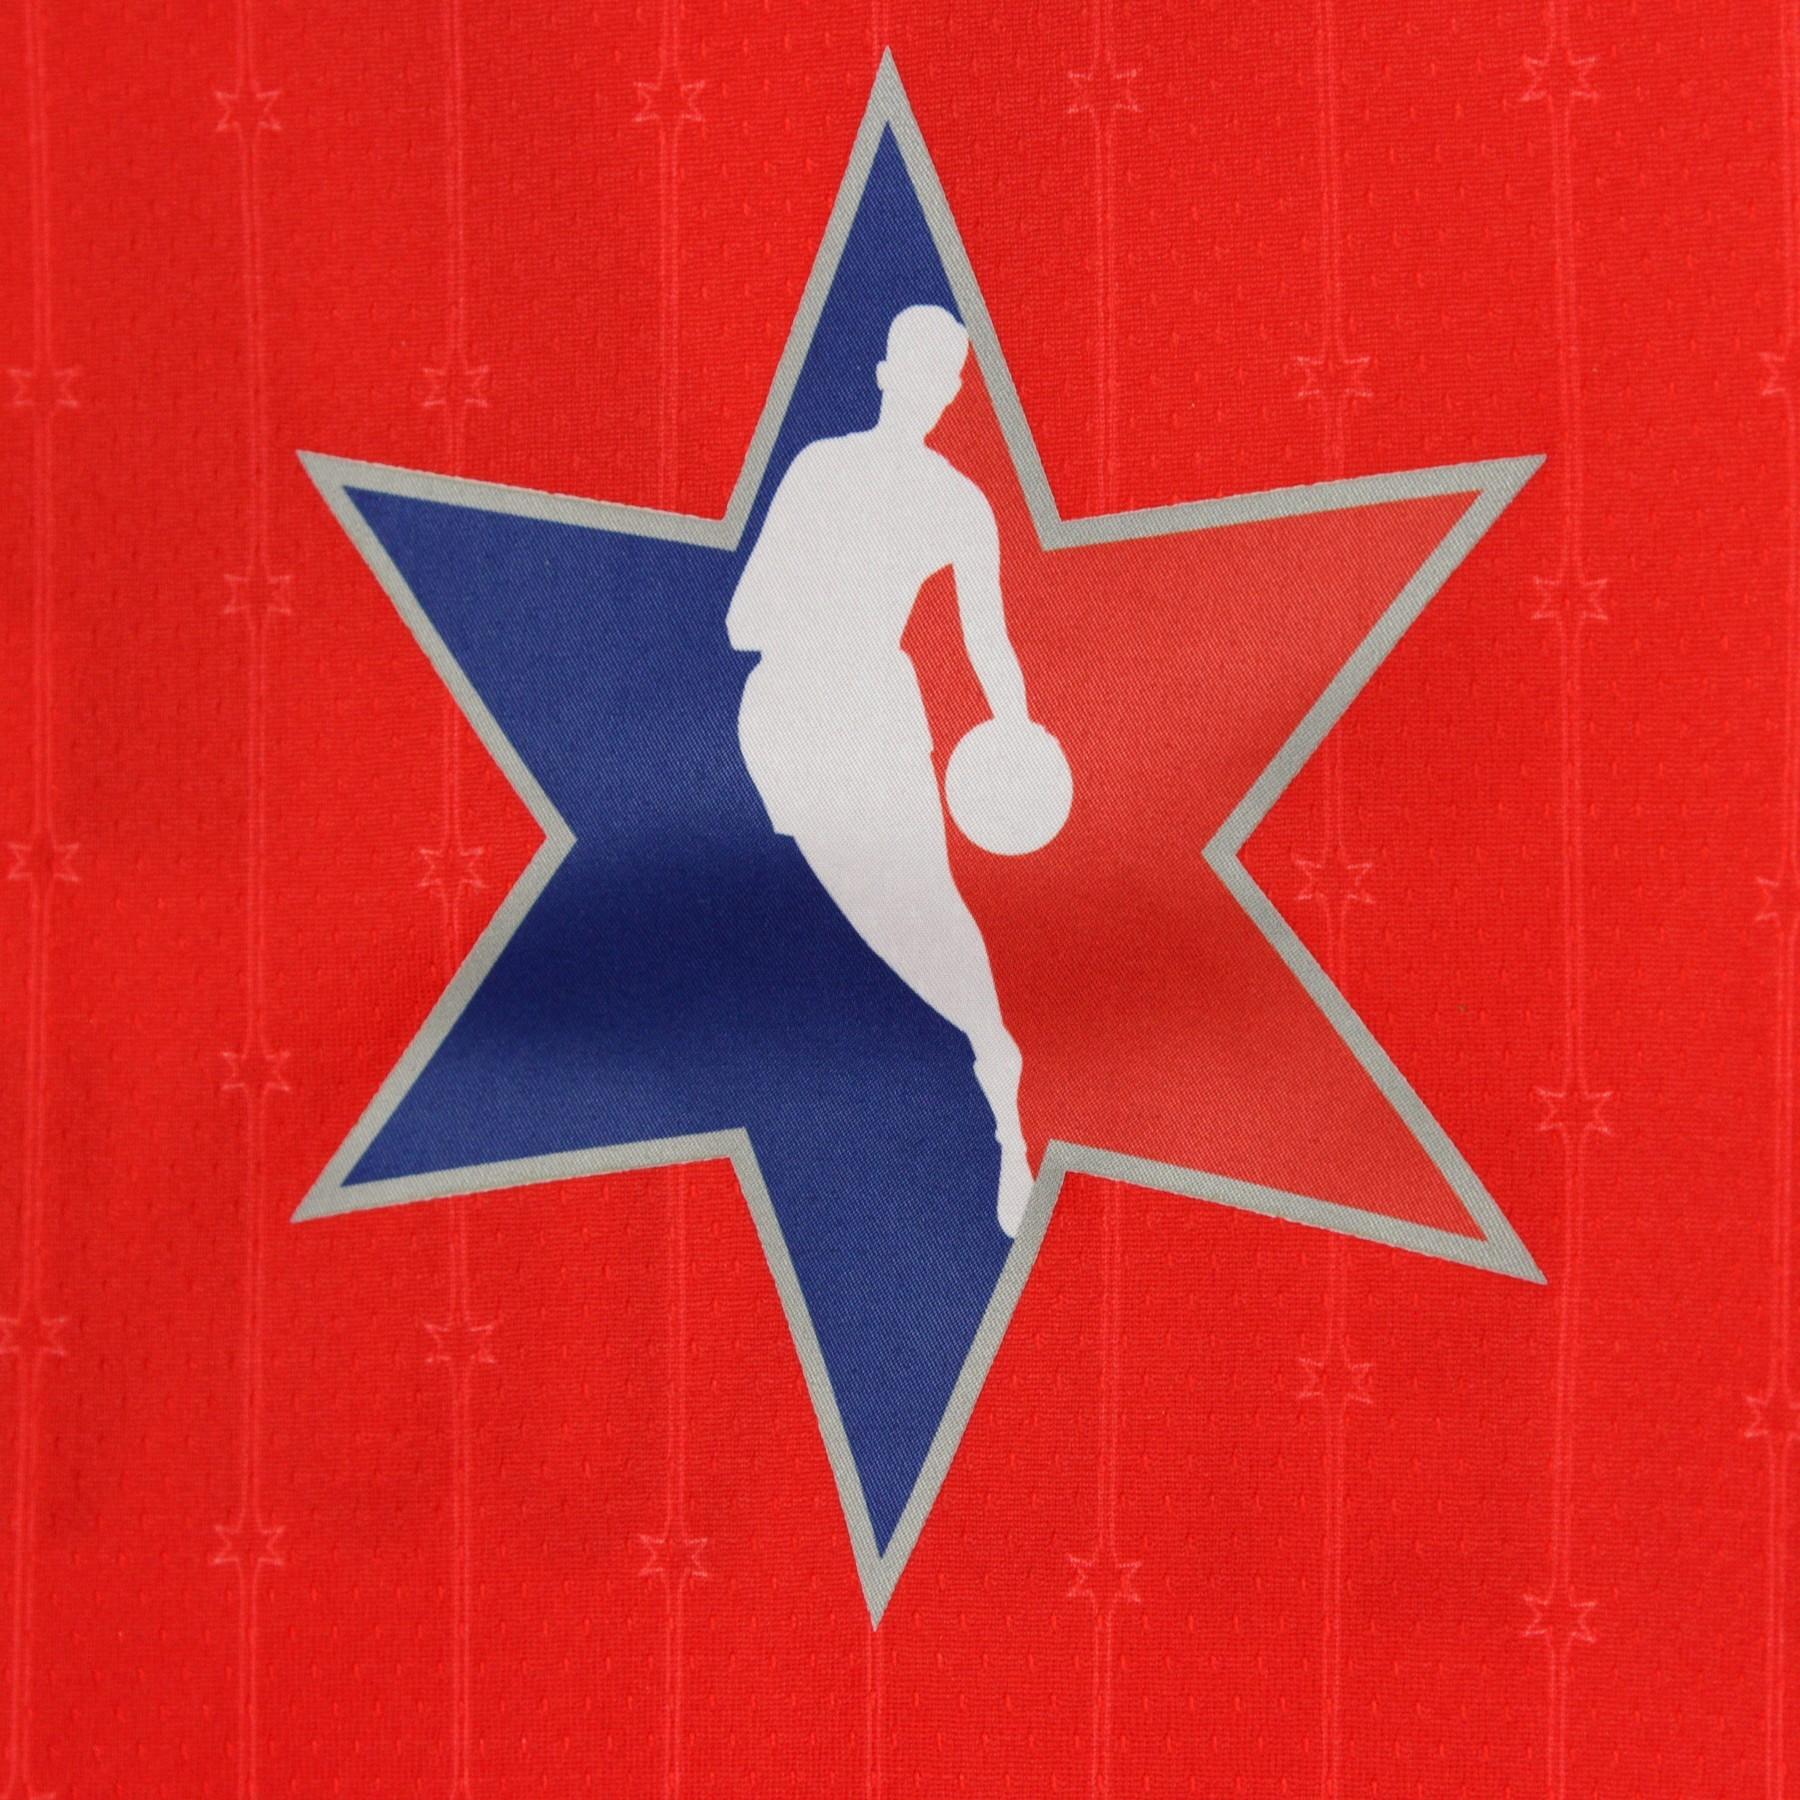 CANOTTA BASKET NBA SWINGMAN JERSEY NO23 LEBRON JAMES